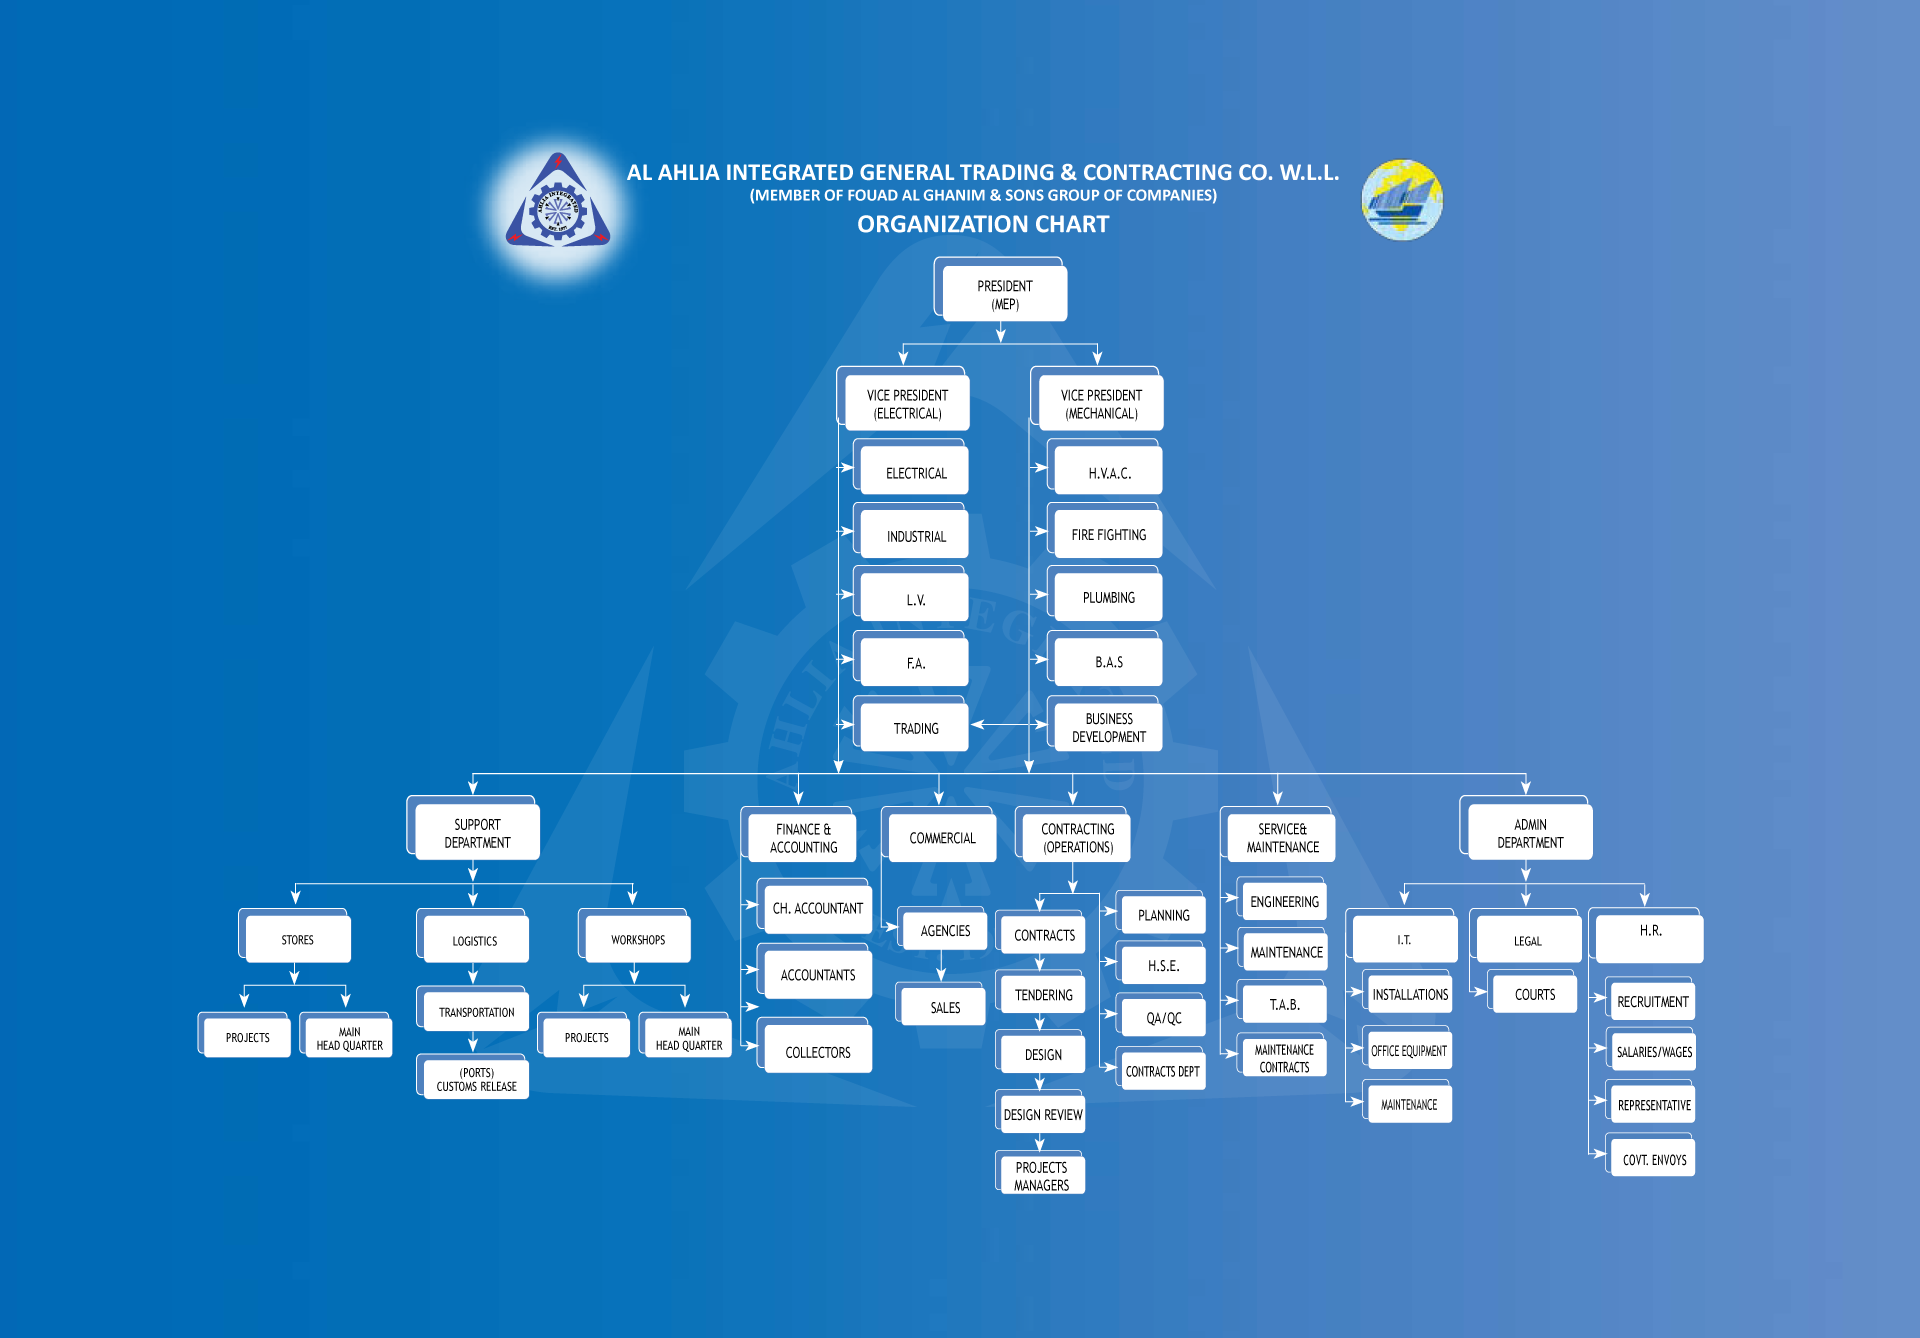 Organization Chart Al Ahlia Integrated